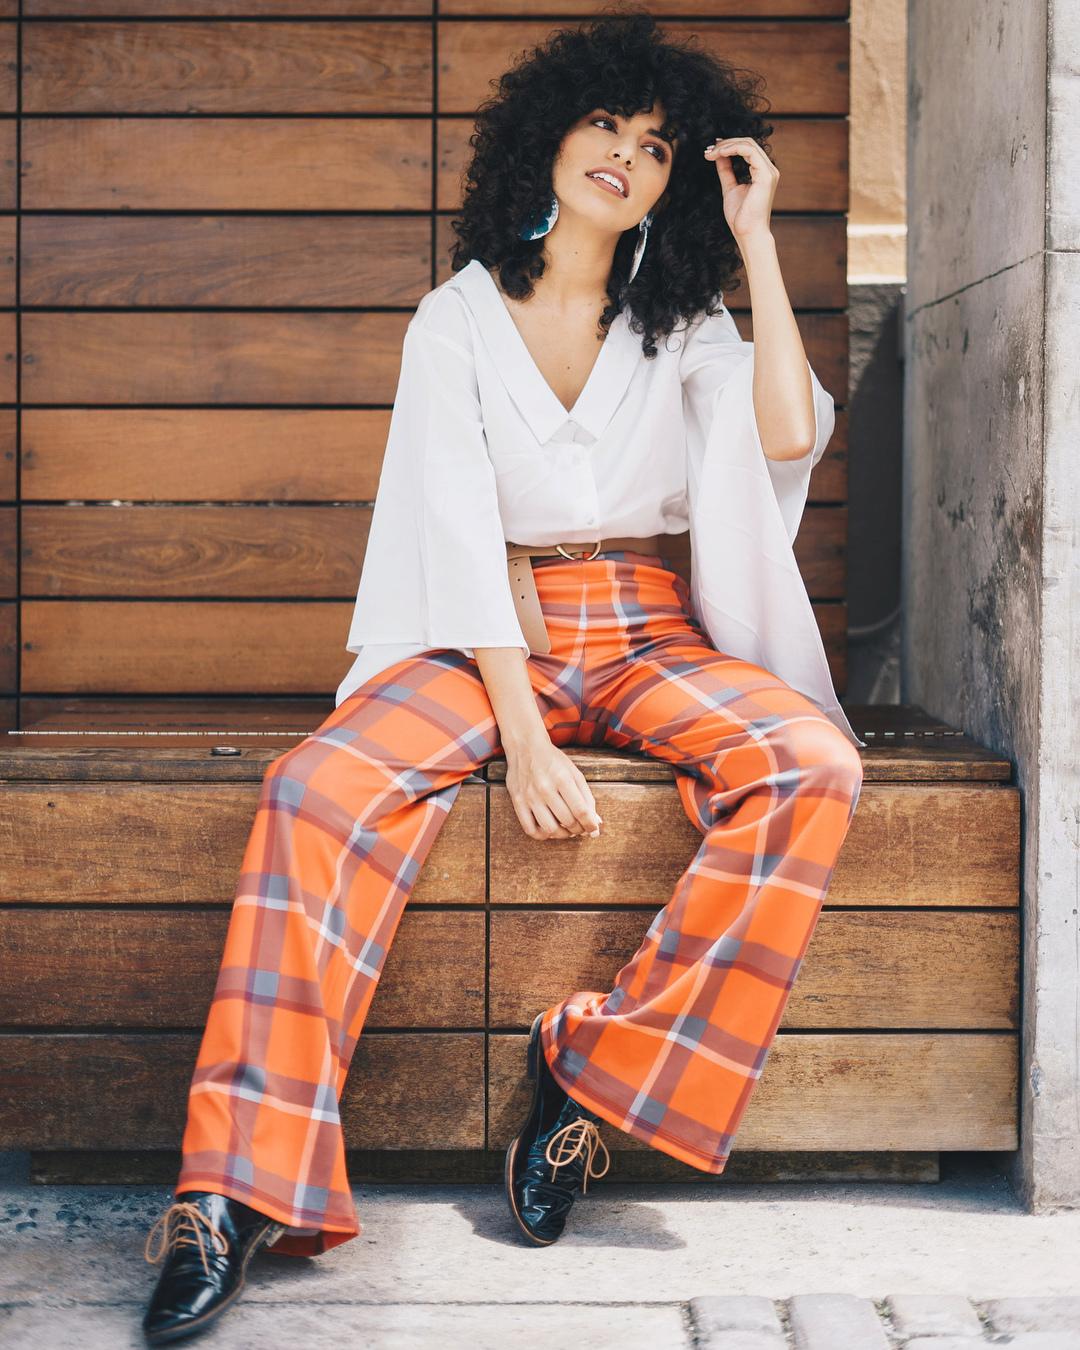 yuanilie alvarado, segunda finalista de reyna hispanoamericana 2019. 33535410